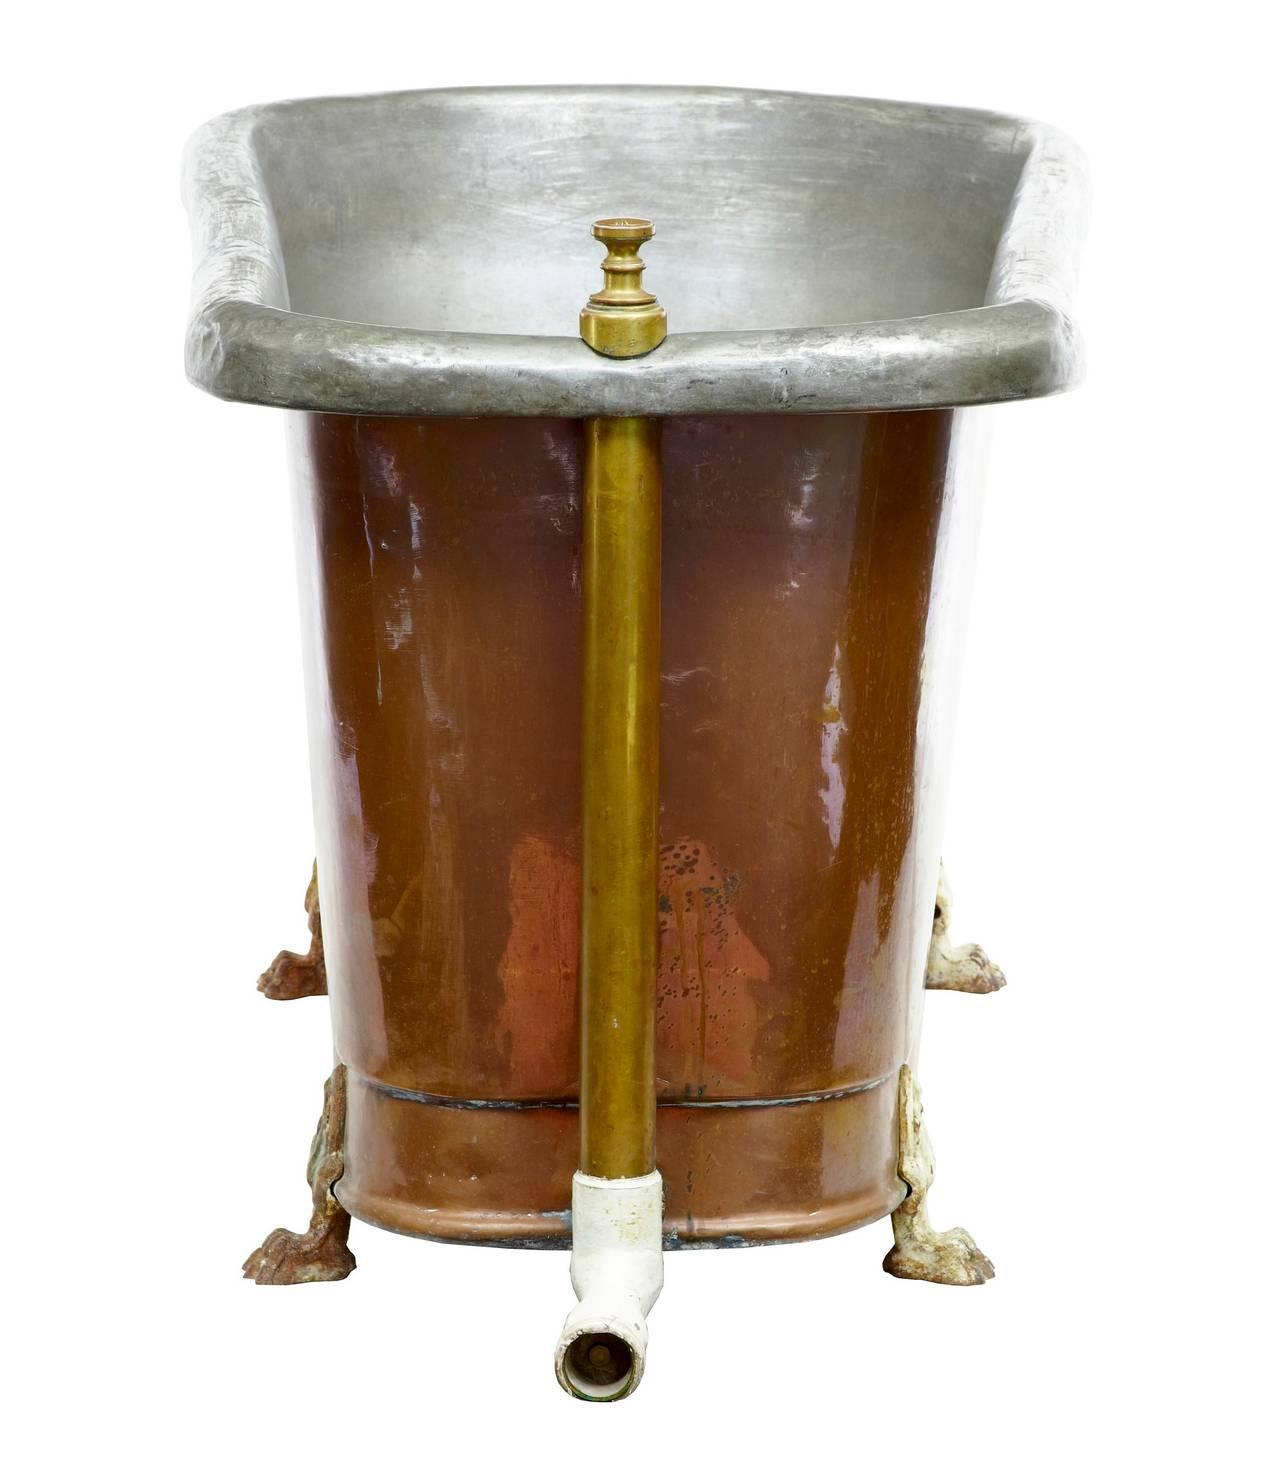 19th century victorian roll top copper bath tub at 1stdibs. Black Bedroom Furniture Sets. Home Design Ideas